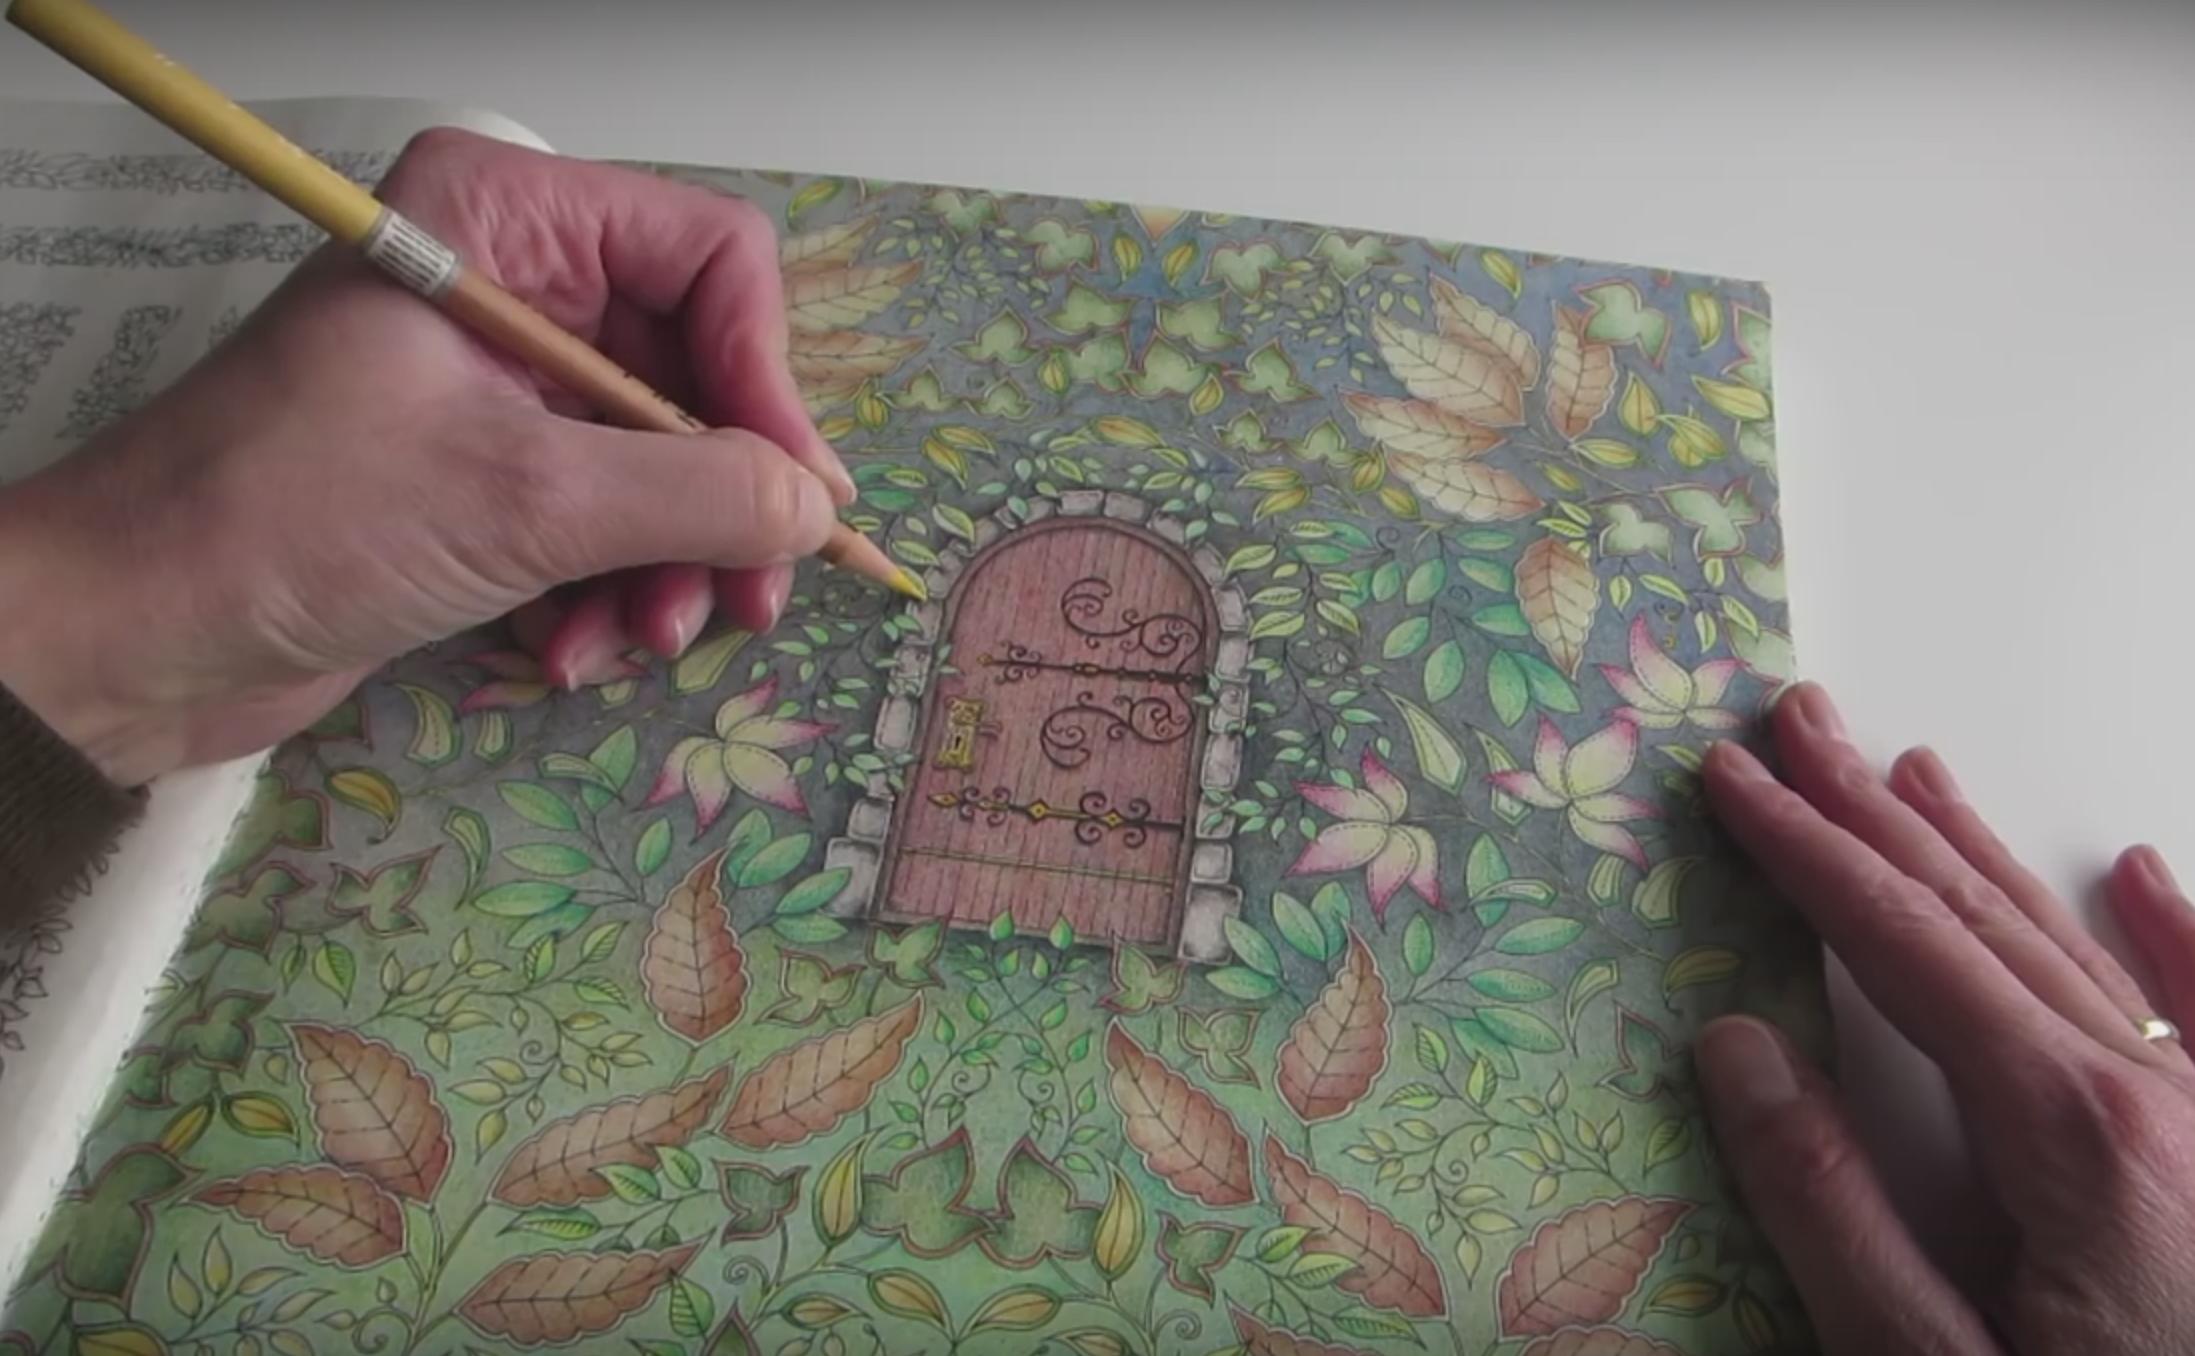 The secret garden coloring book review - The Secret Garden Coloring Book Review 8